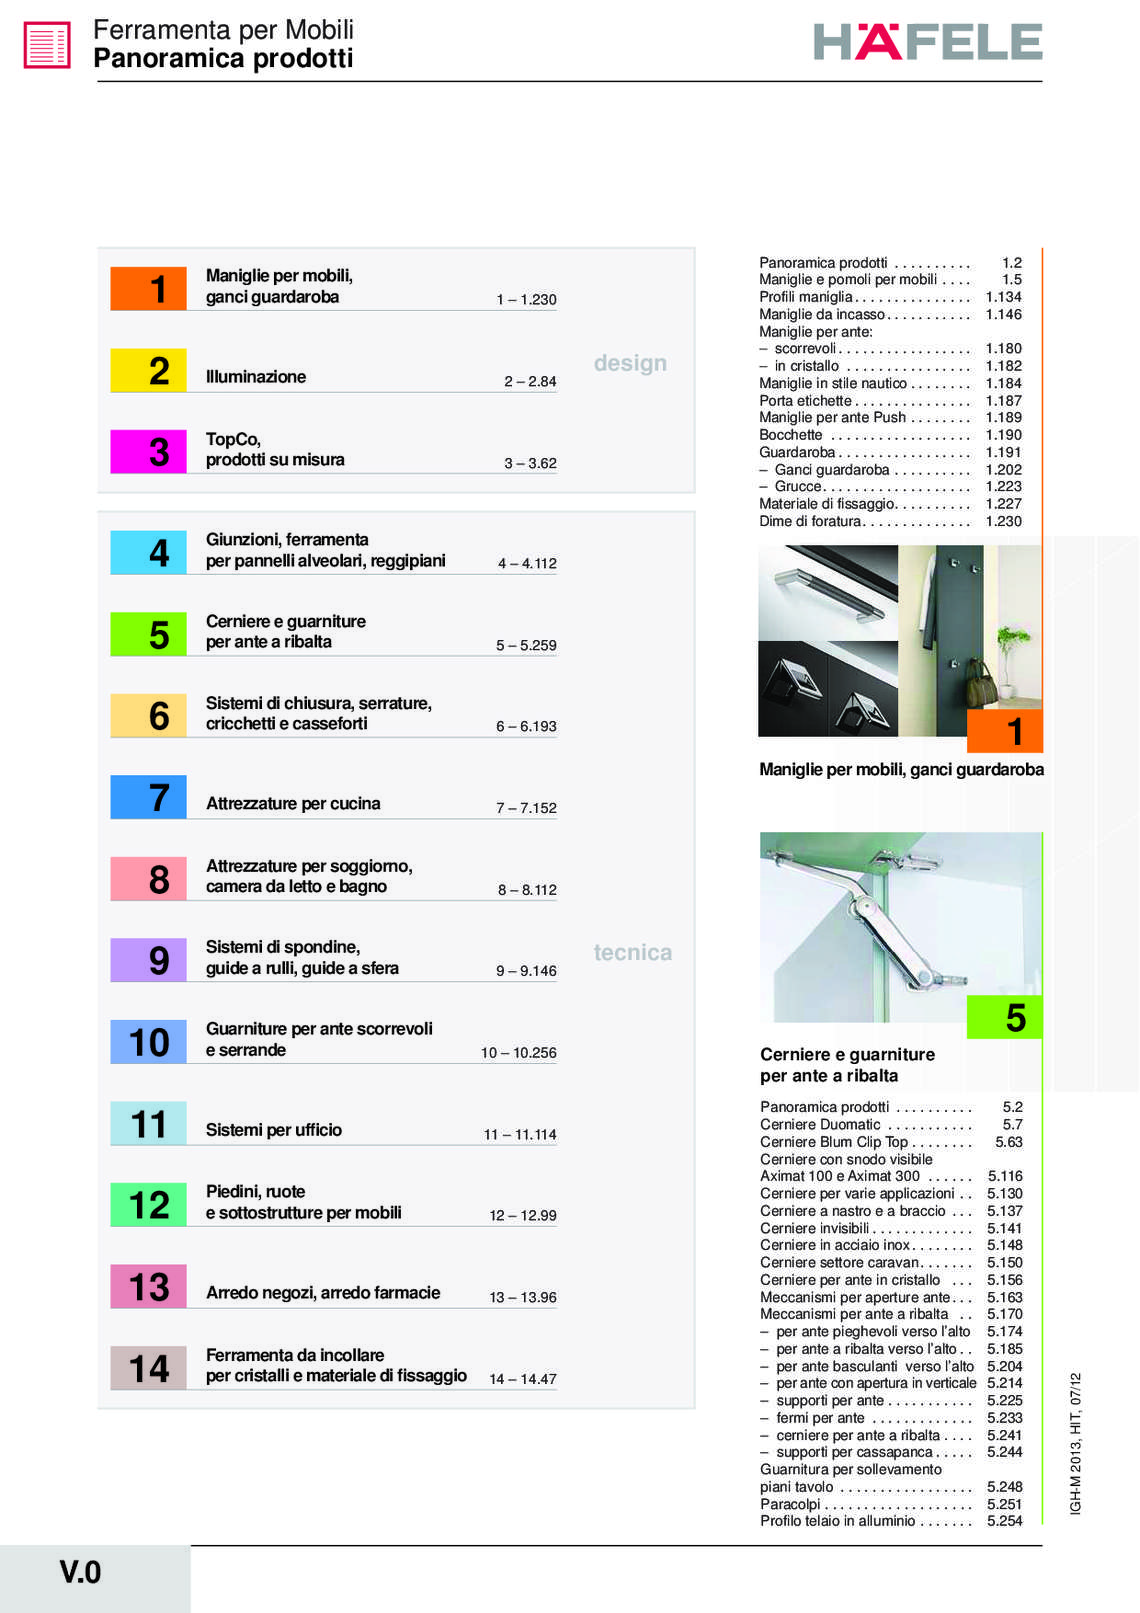 hafele-spondine-e-guide-per-mobili_40_001.jpg